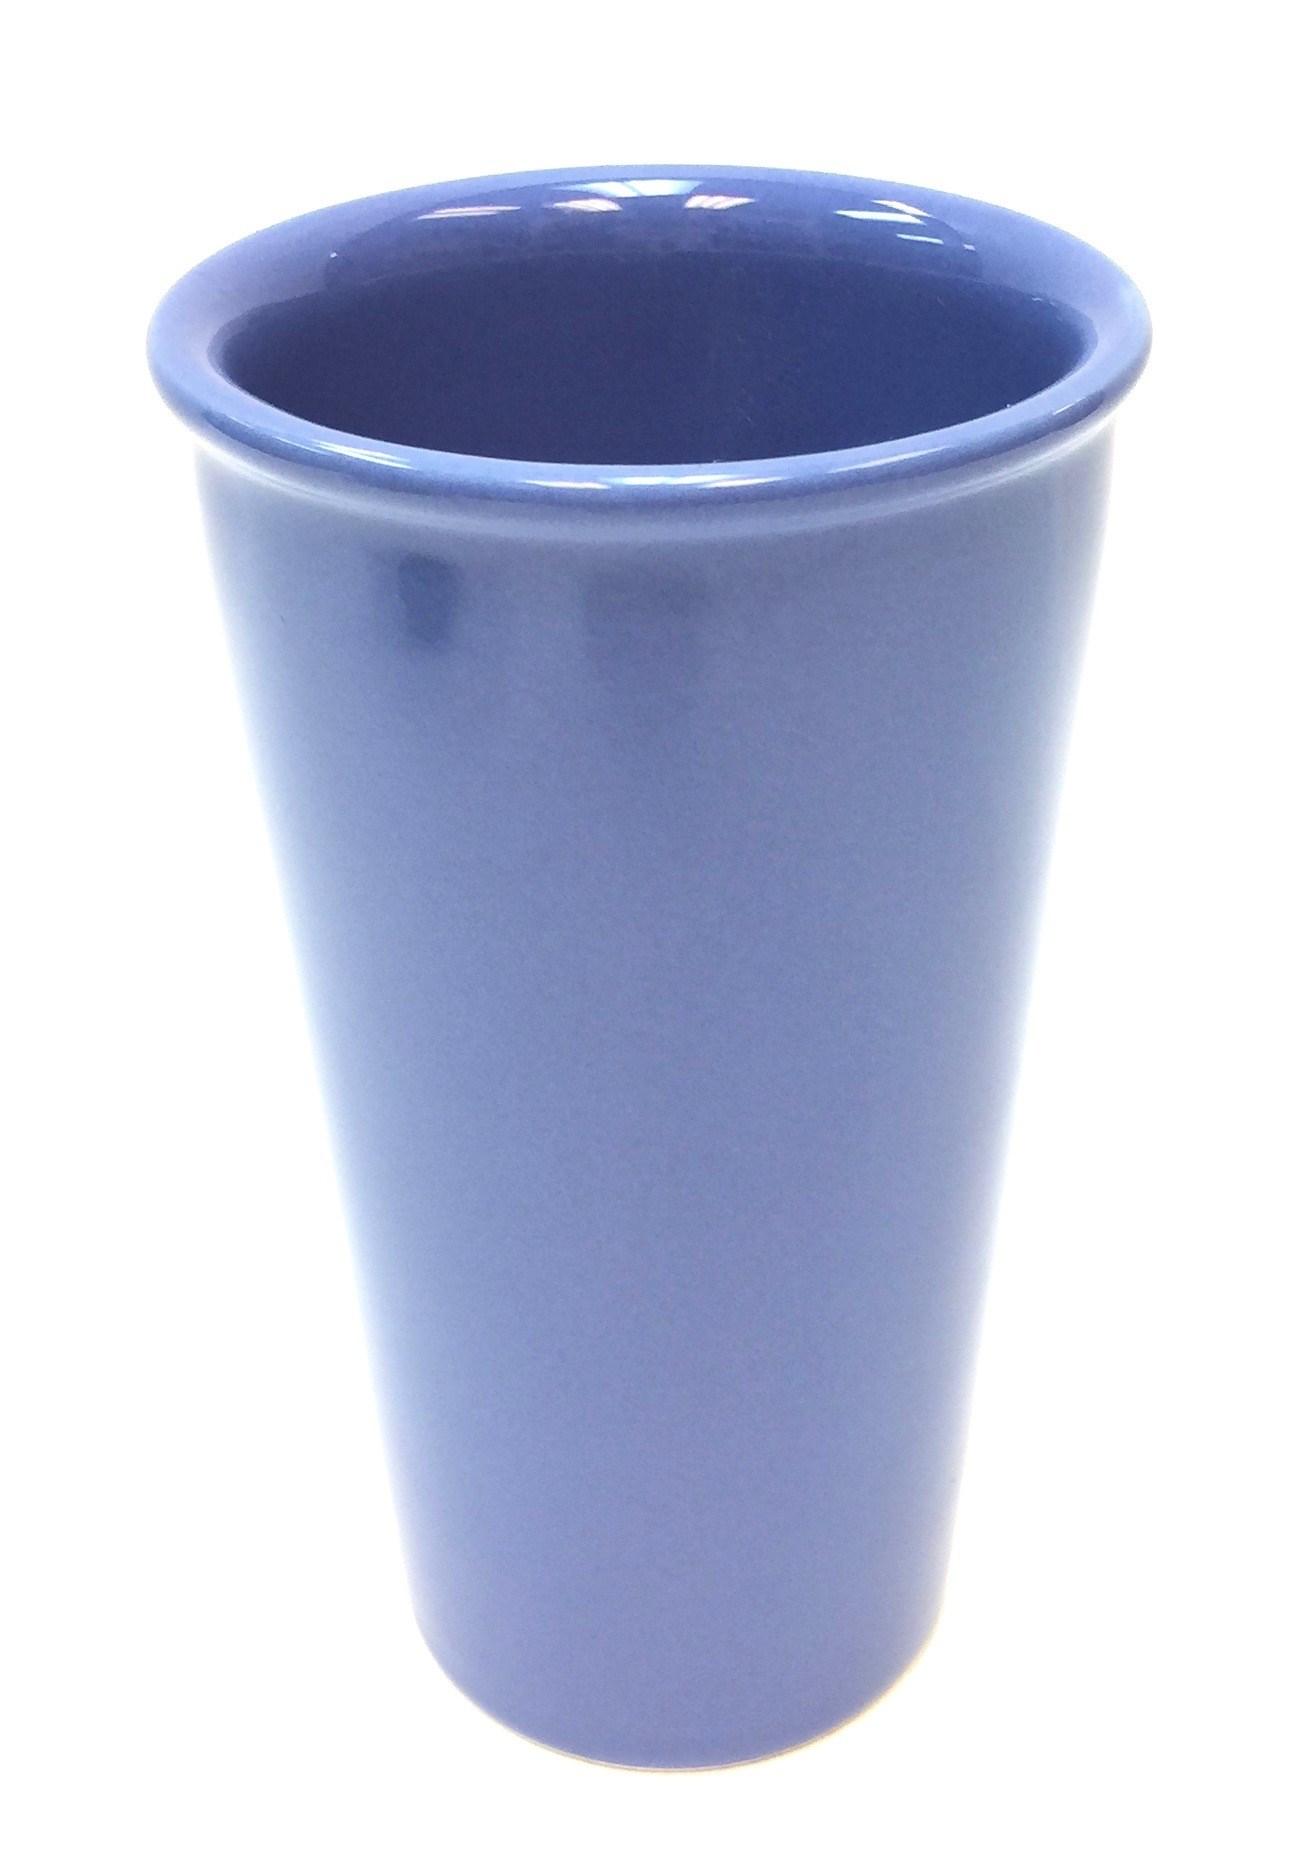 11 Oz Ceramic Travel Mug - Ocean Blue